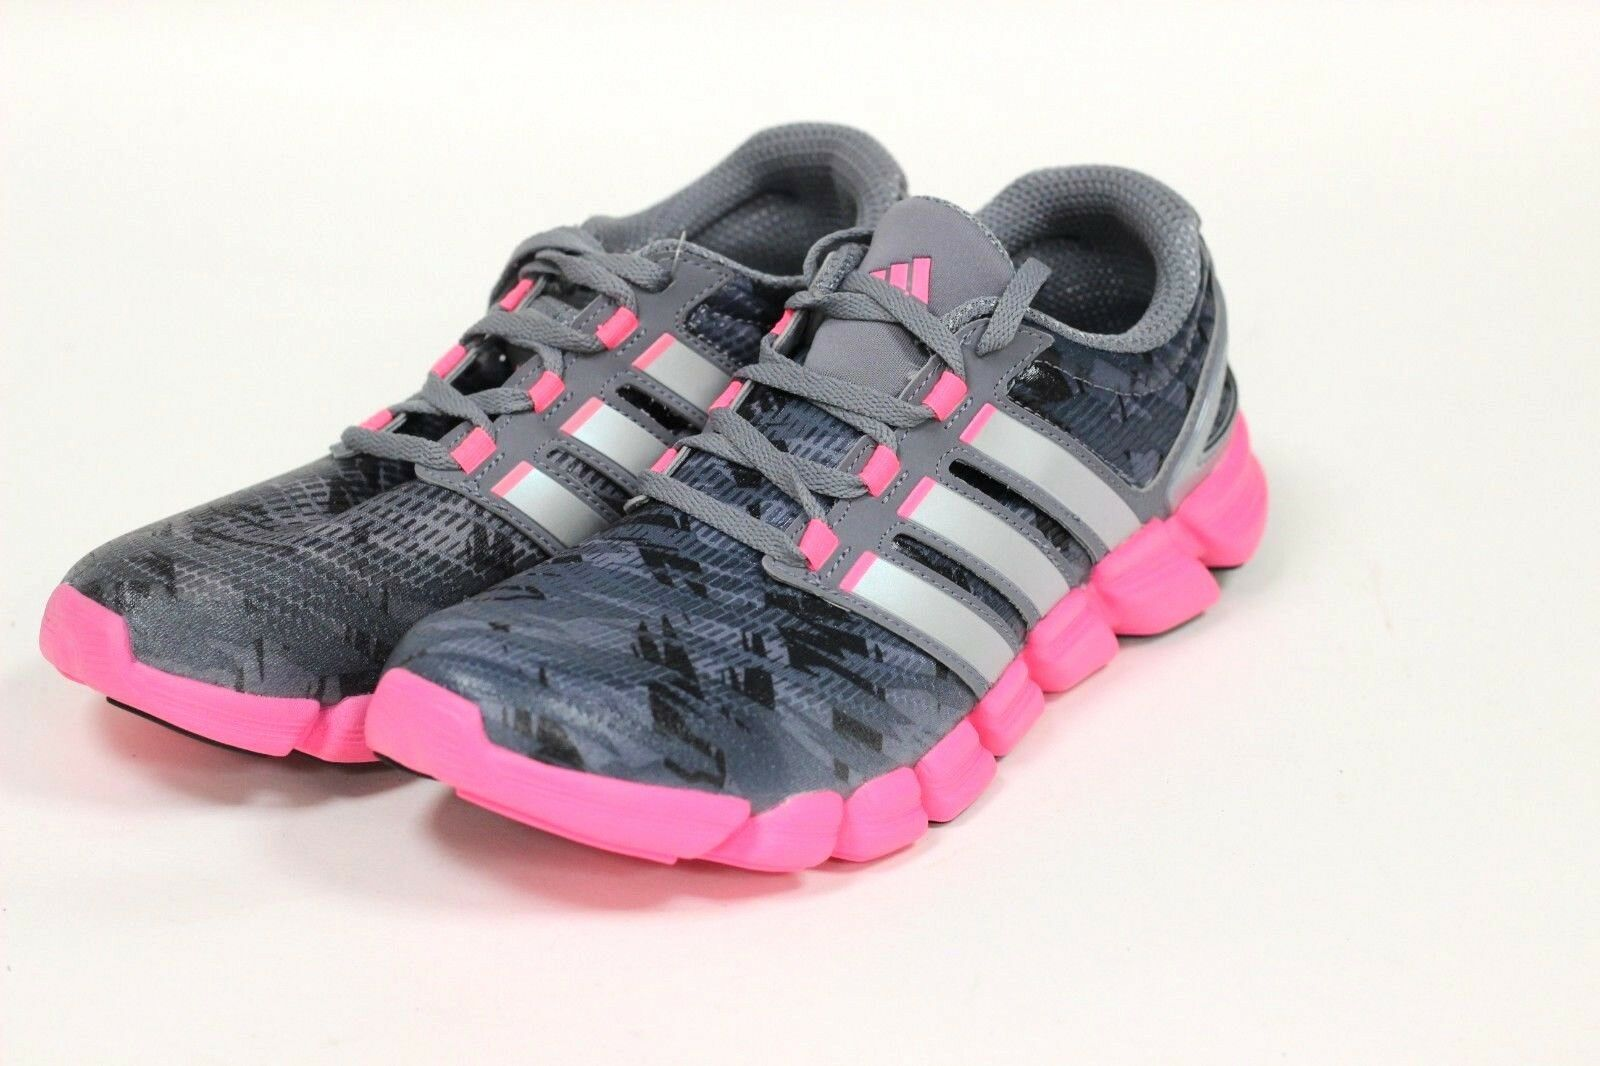 5fbd99f7991d2b ... clearance adidas frauen adipure verrückt schnell schuhe authentic grau  adidas silber rosa m22588 2a3e02 38889 a980b